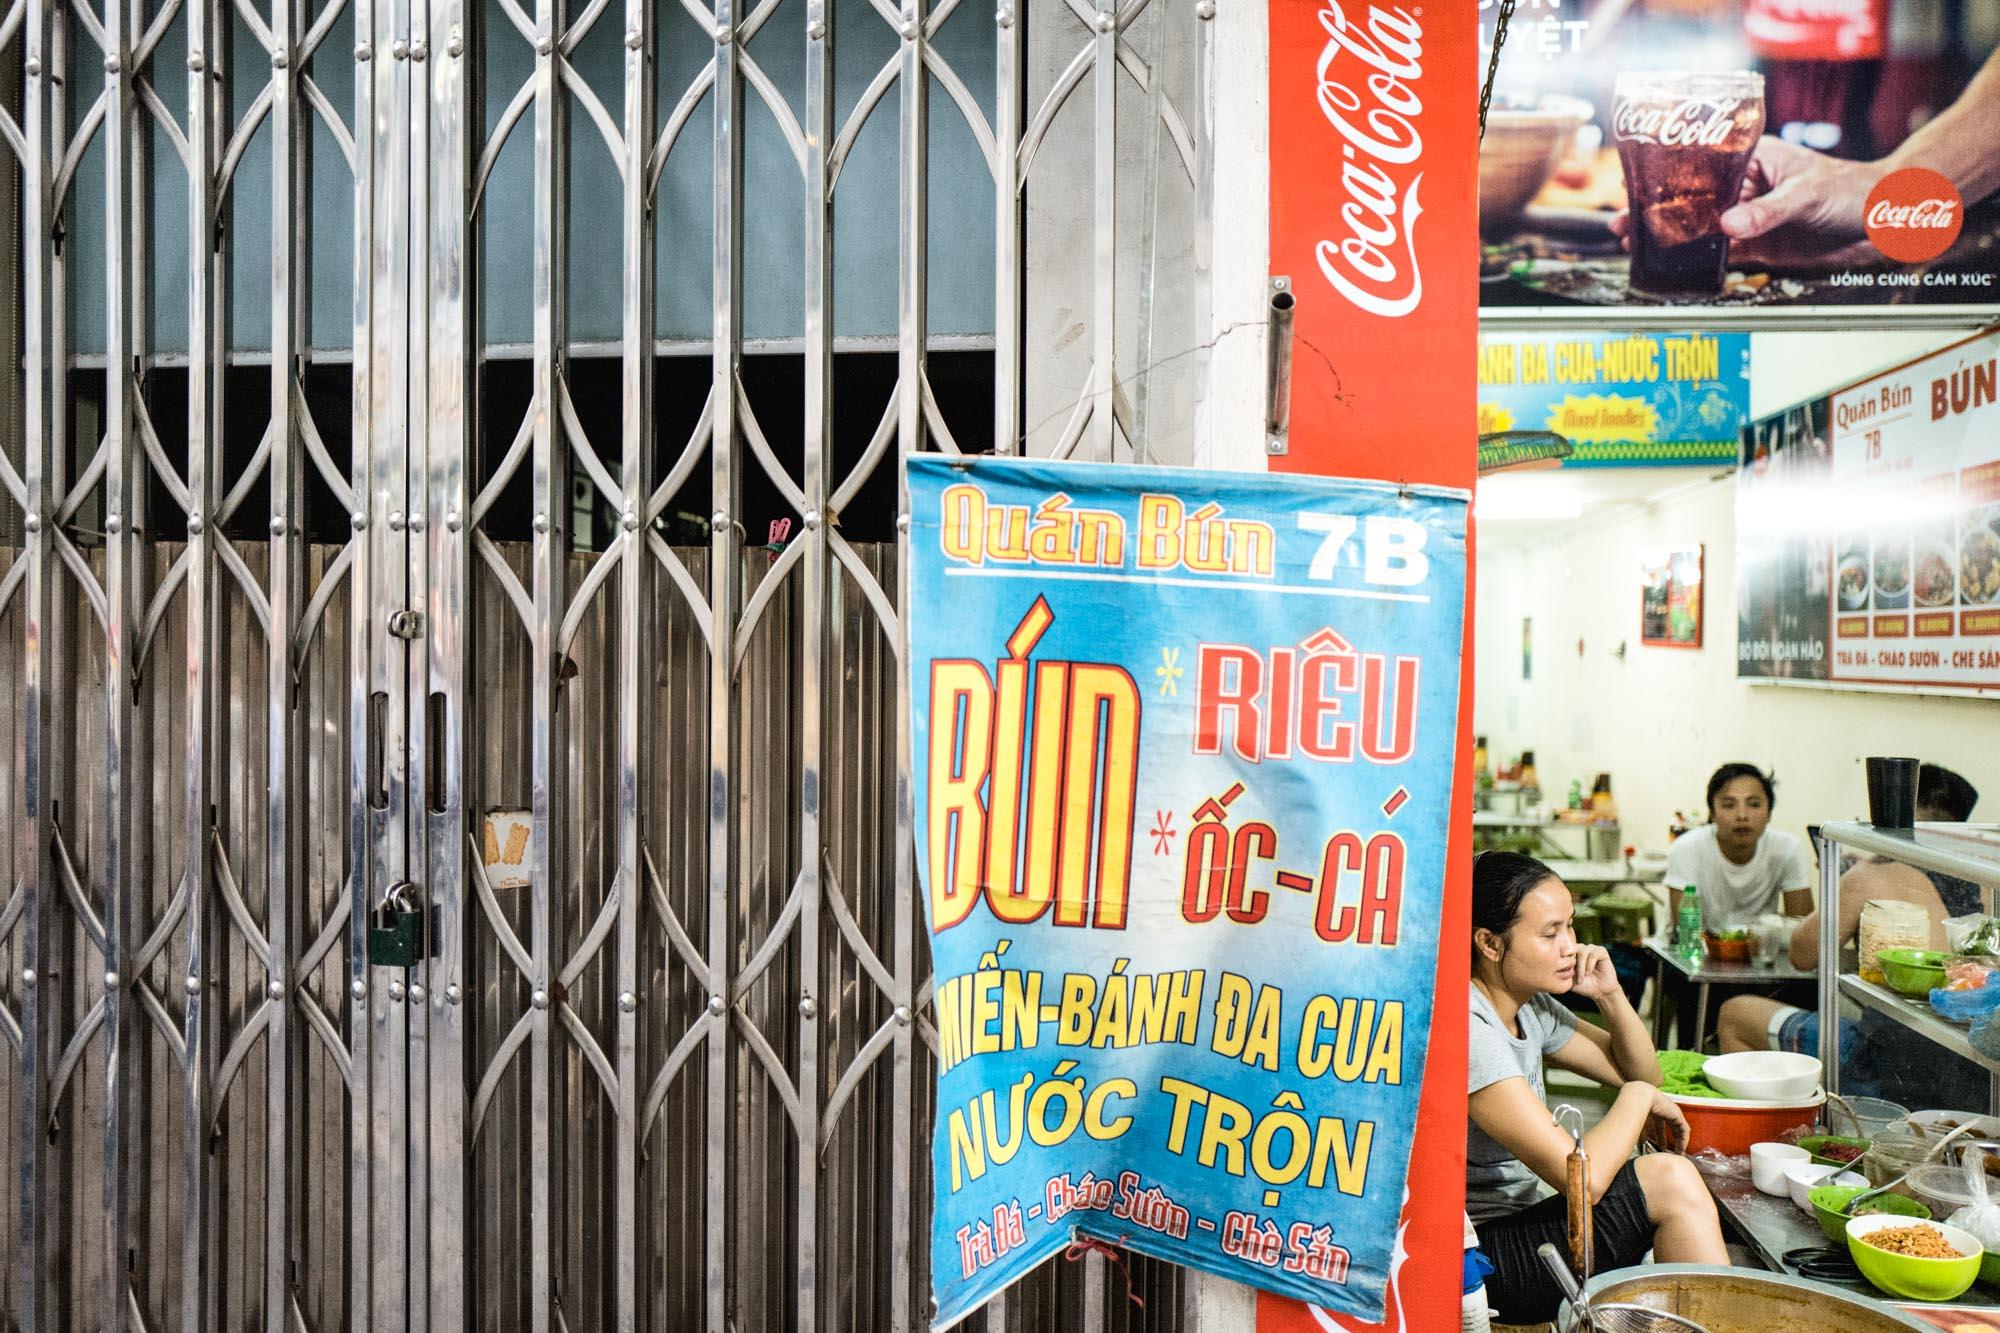 Hanoi, Vietnam - Streetfood